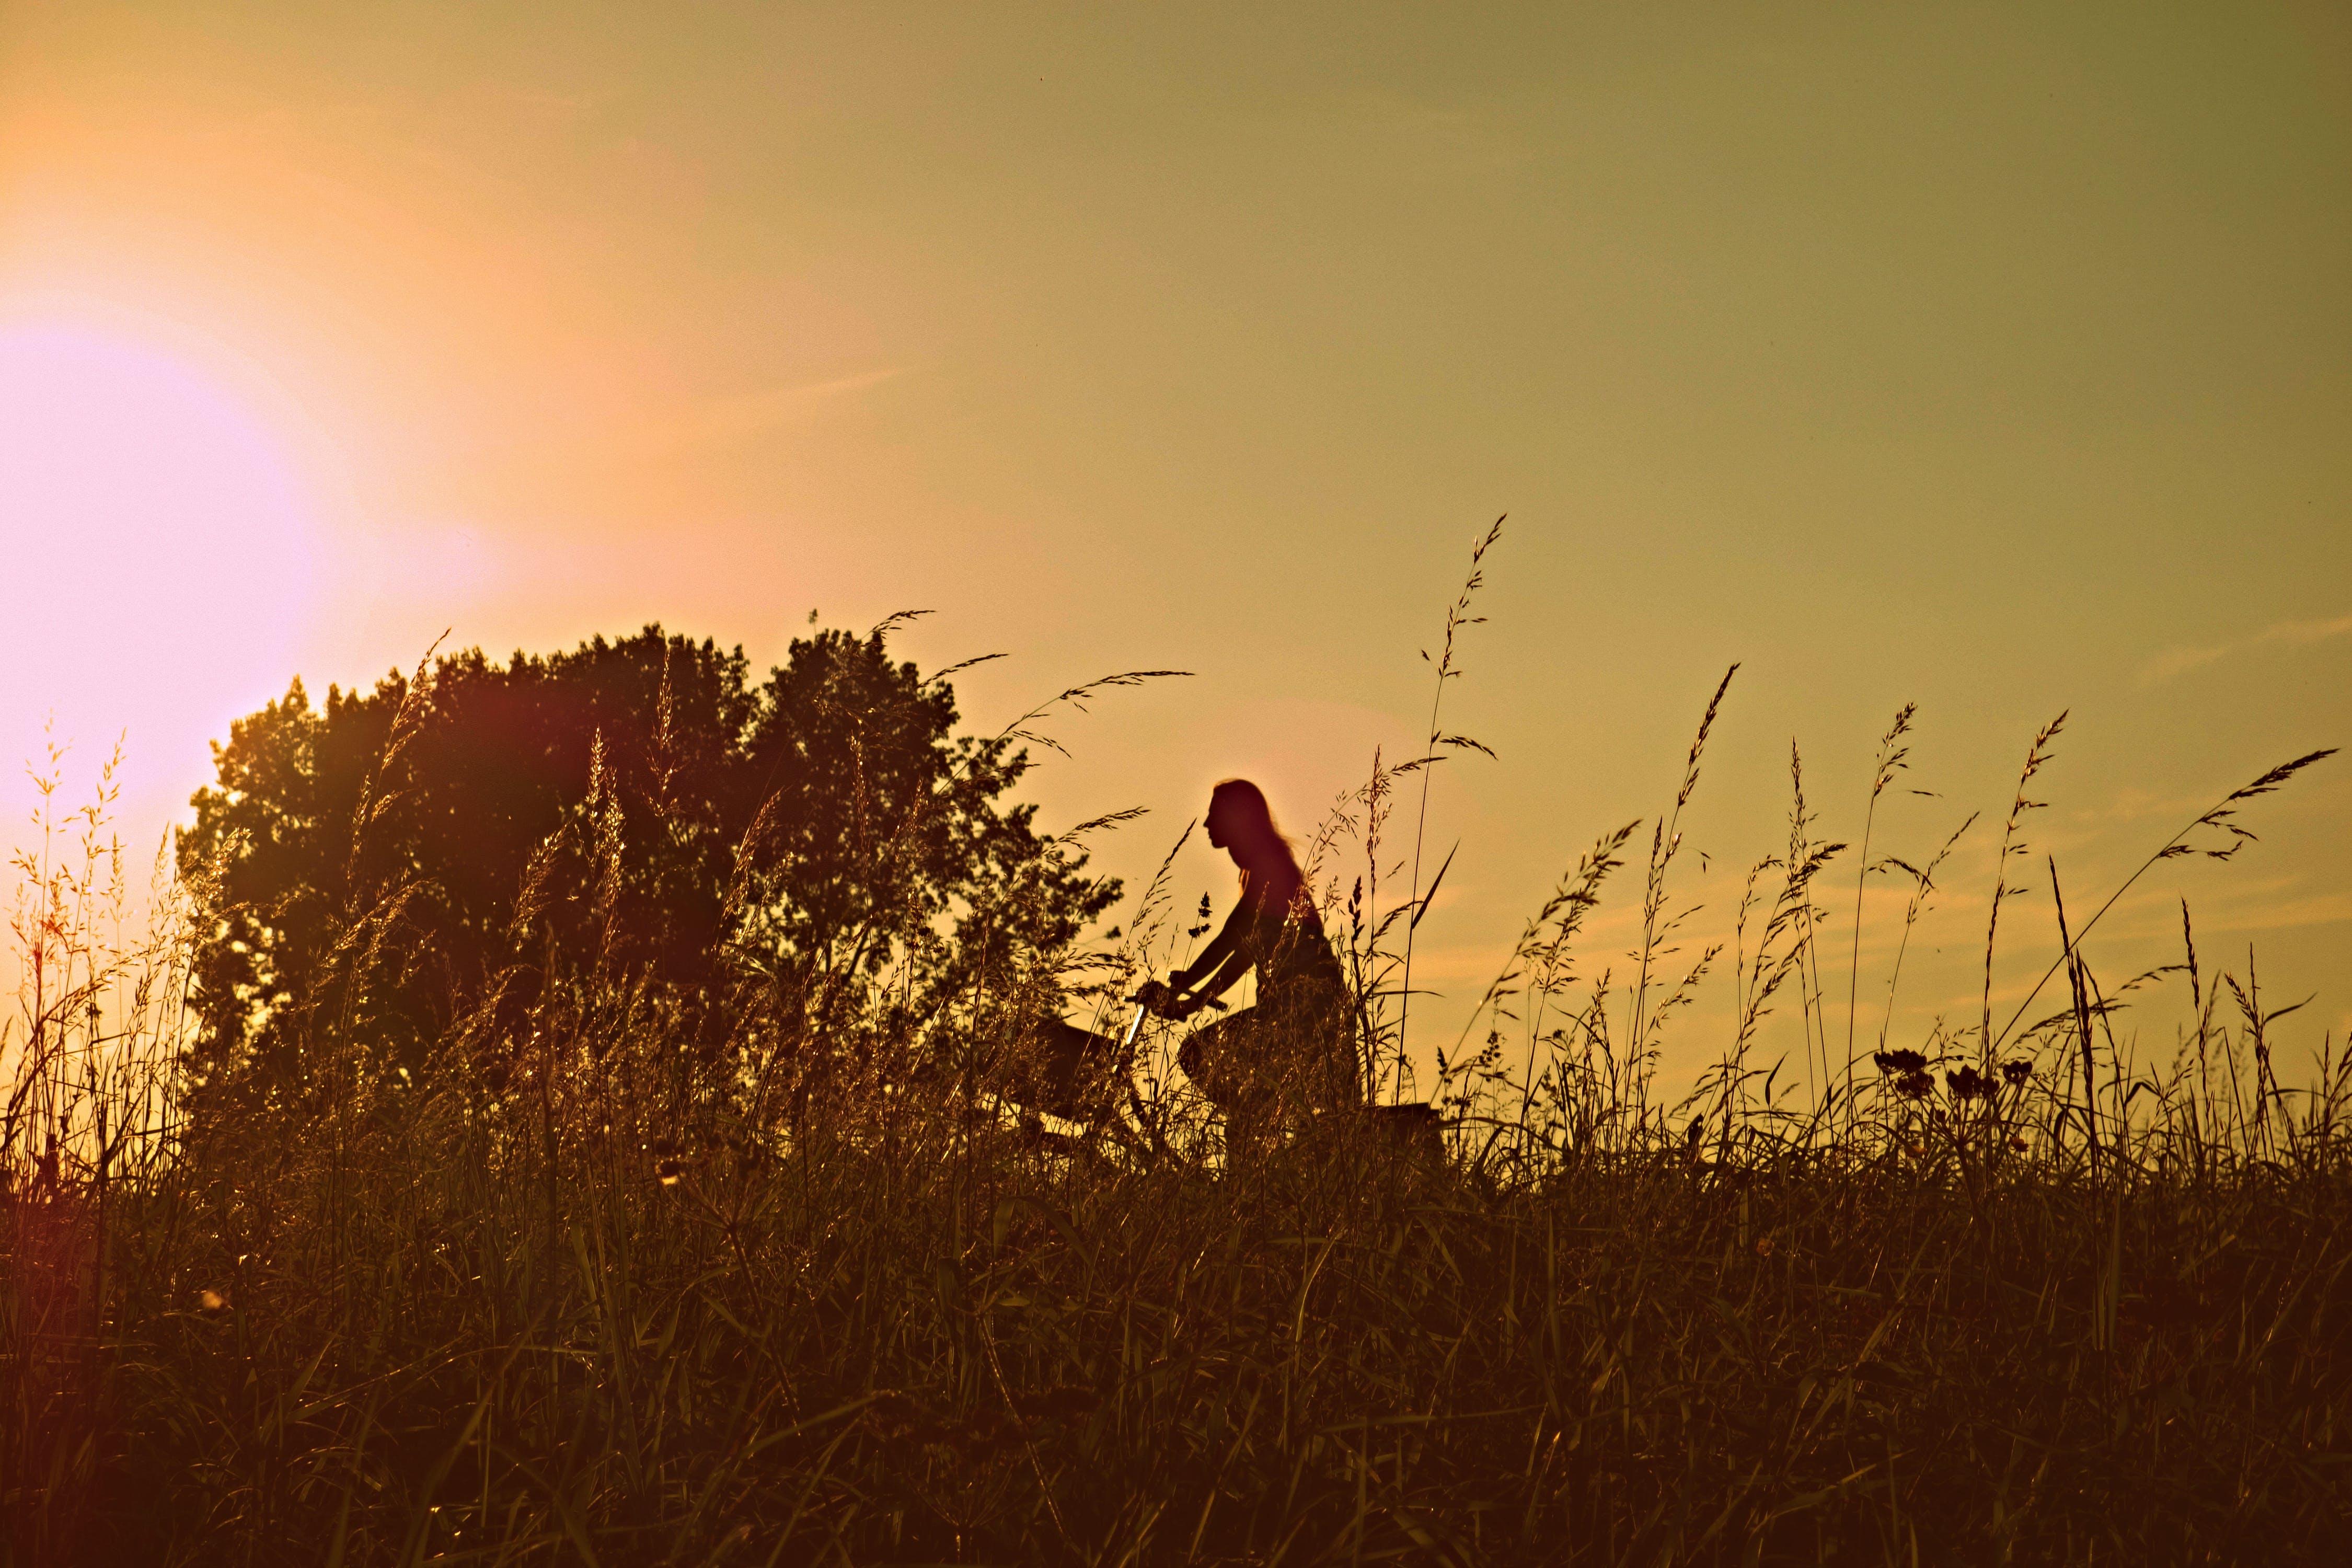 Free stock photo of woman, sun, silhouette, countryside